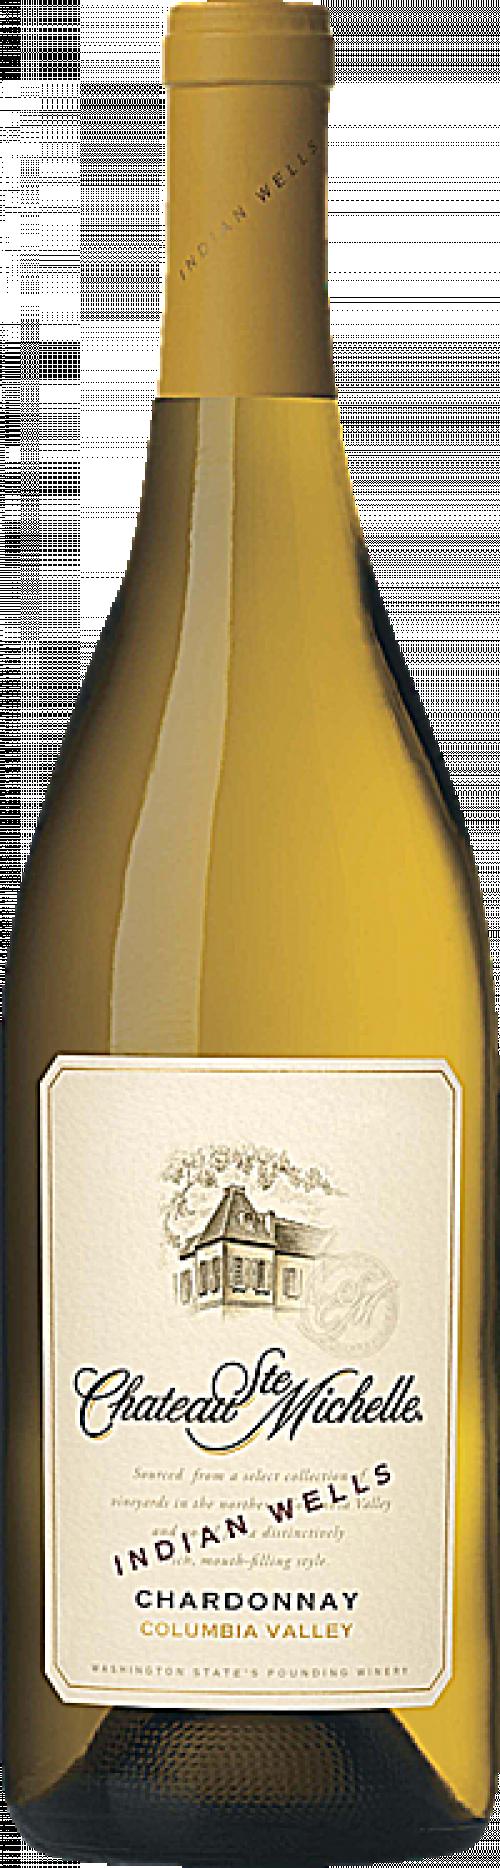 2019 Chateau Ste Michelle Indian Wells Chardonnay 750ml